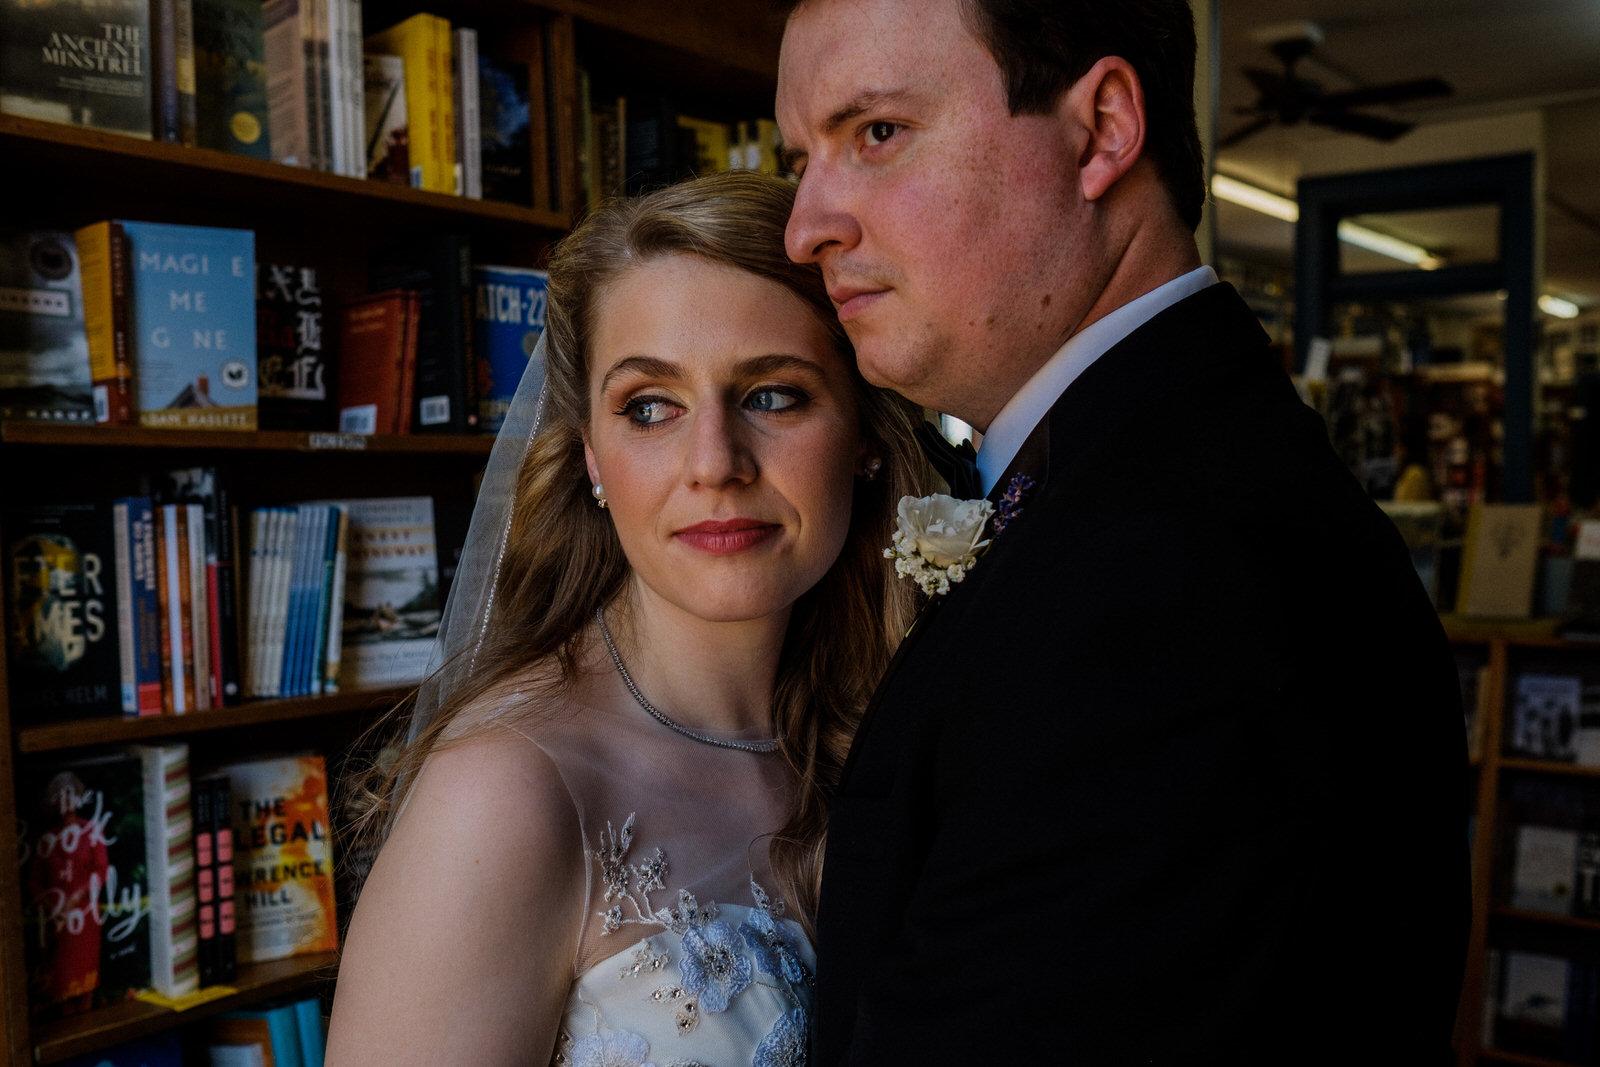 Oxford_Mississippi_wedding_photographer_24.JPG